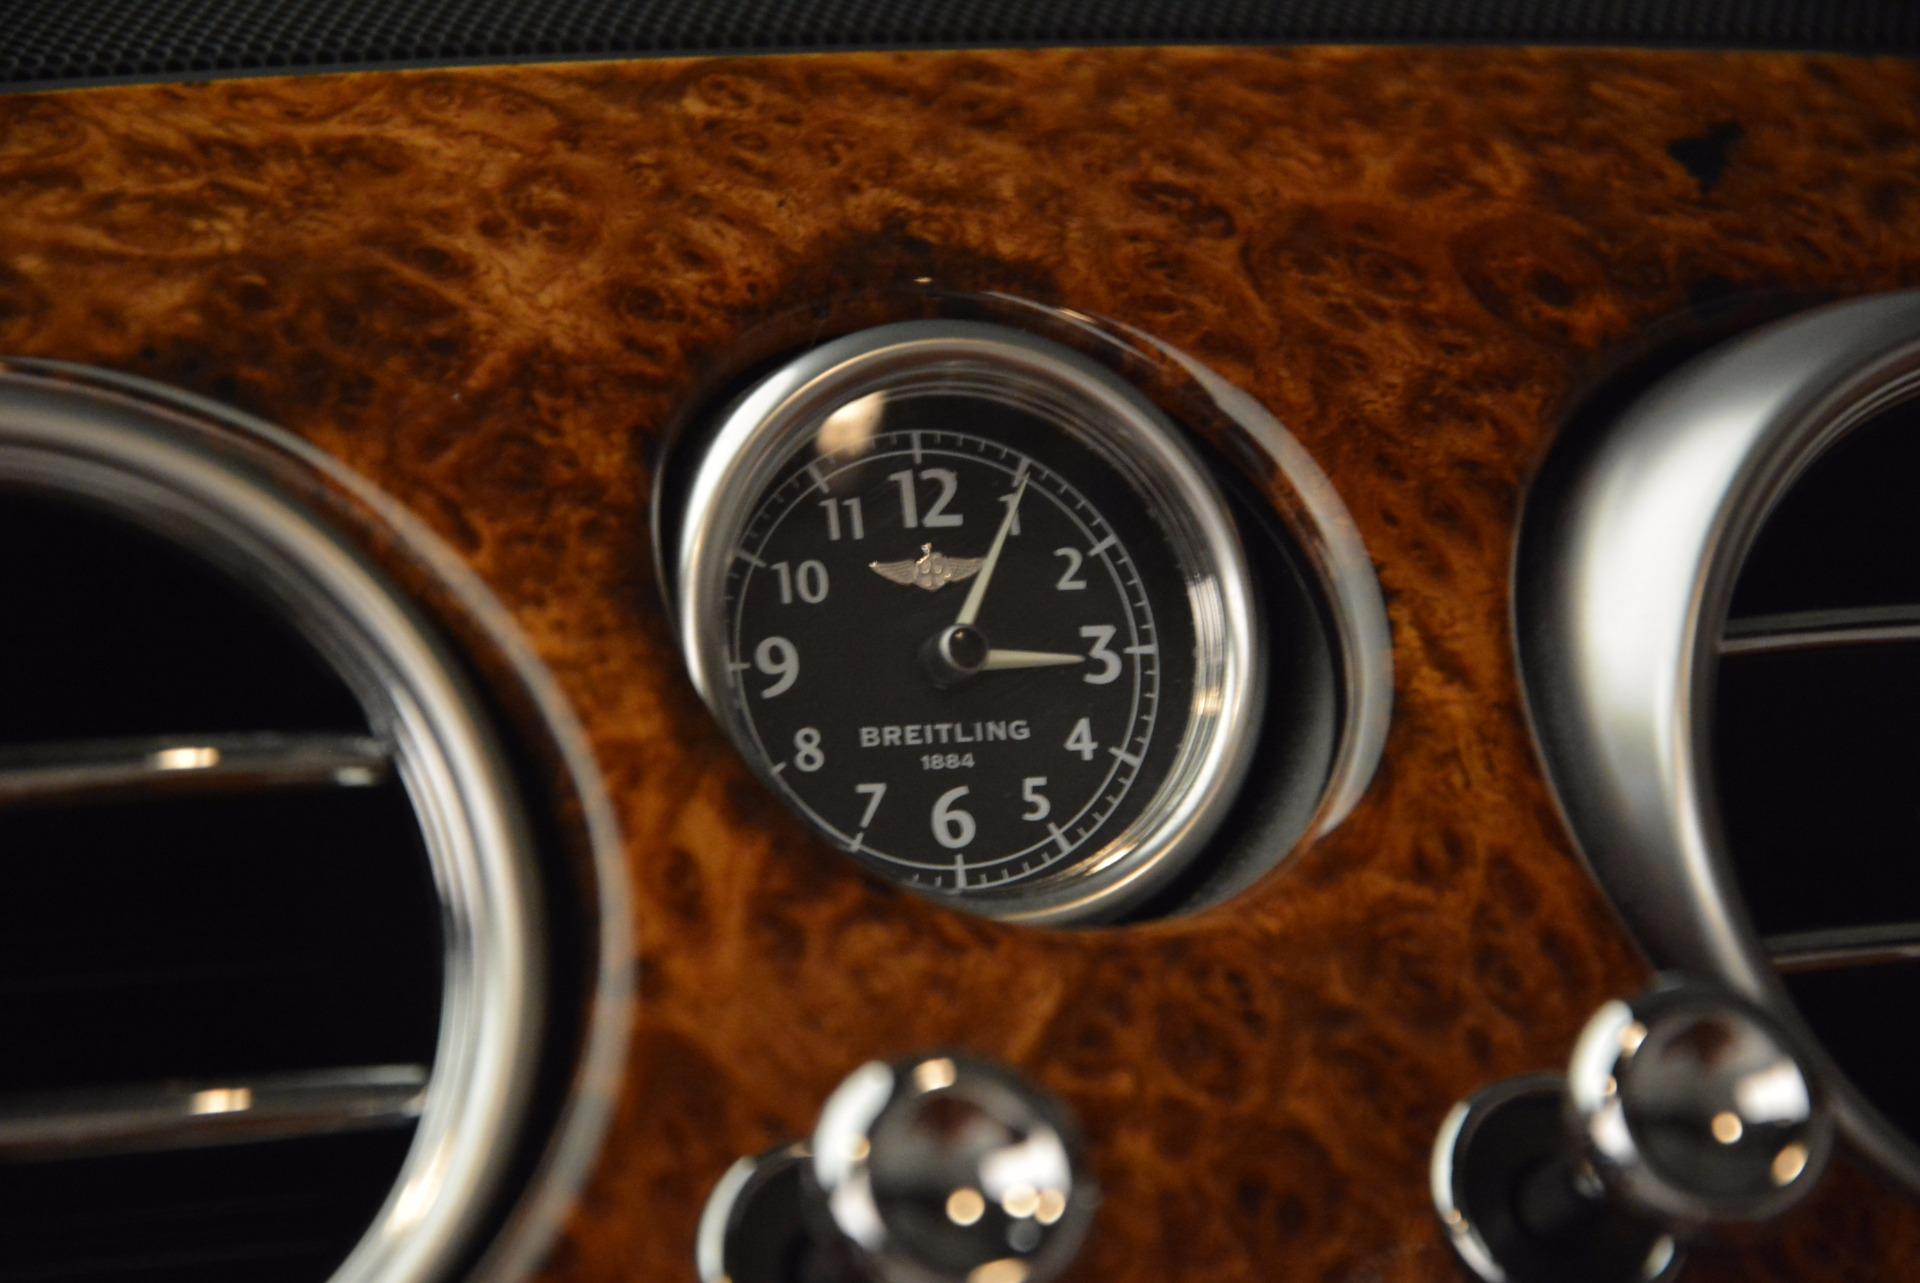 Used 2010 Bentley Continental GT Series 51 For Sale In Westport, CT 1222_p35